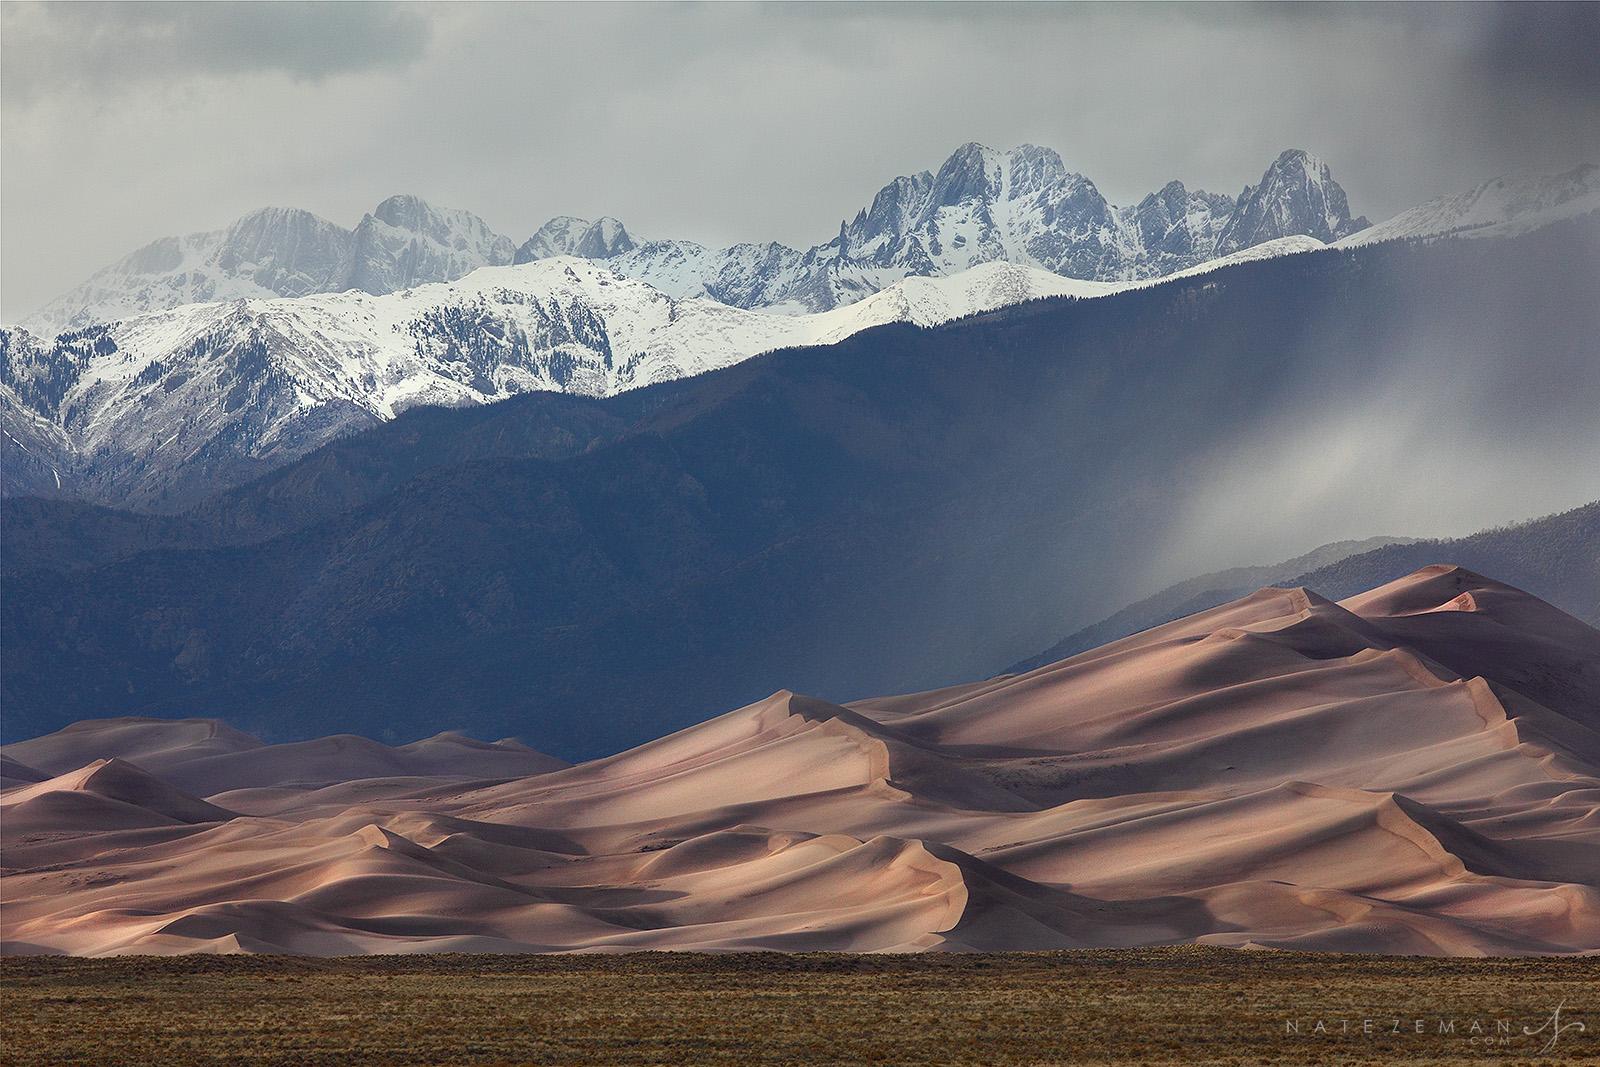 Great sand dunes, national park, dunes, sand, mountains, rain, snow, sangre de cristo, colorado, co, photo